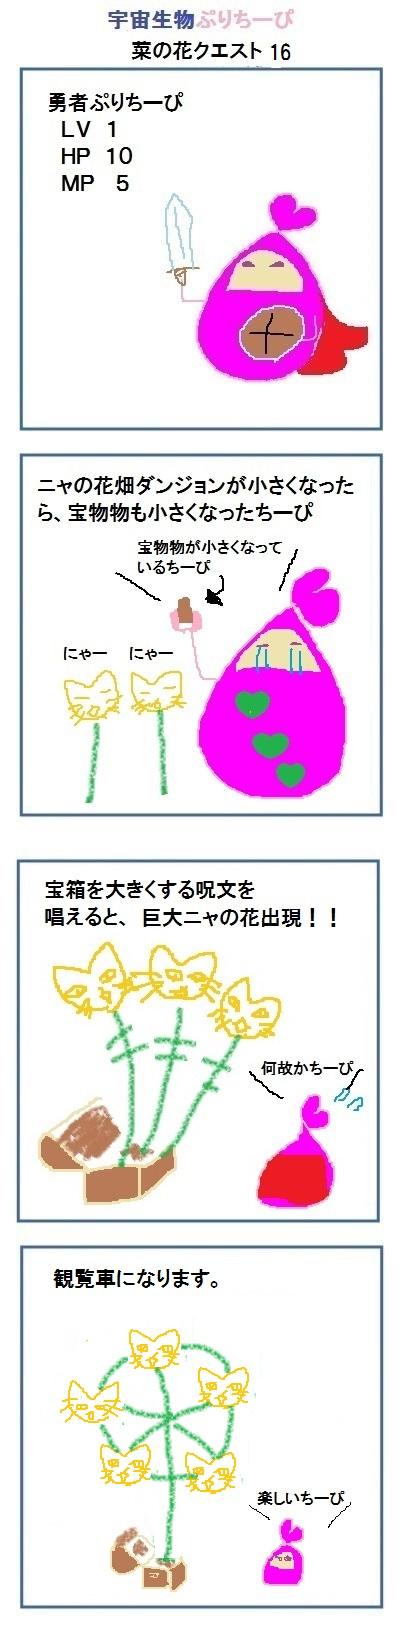 160329_nanohana_quest16.jpg